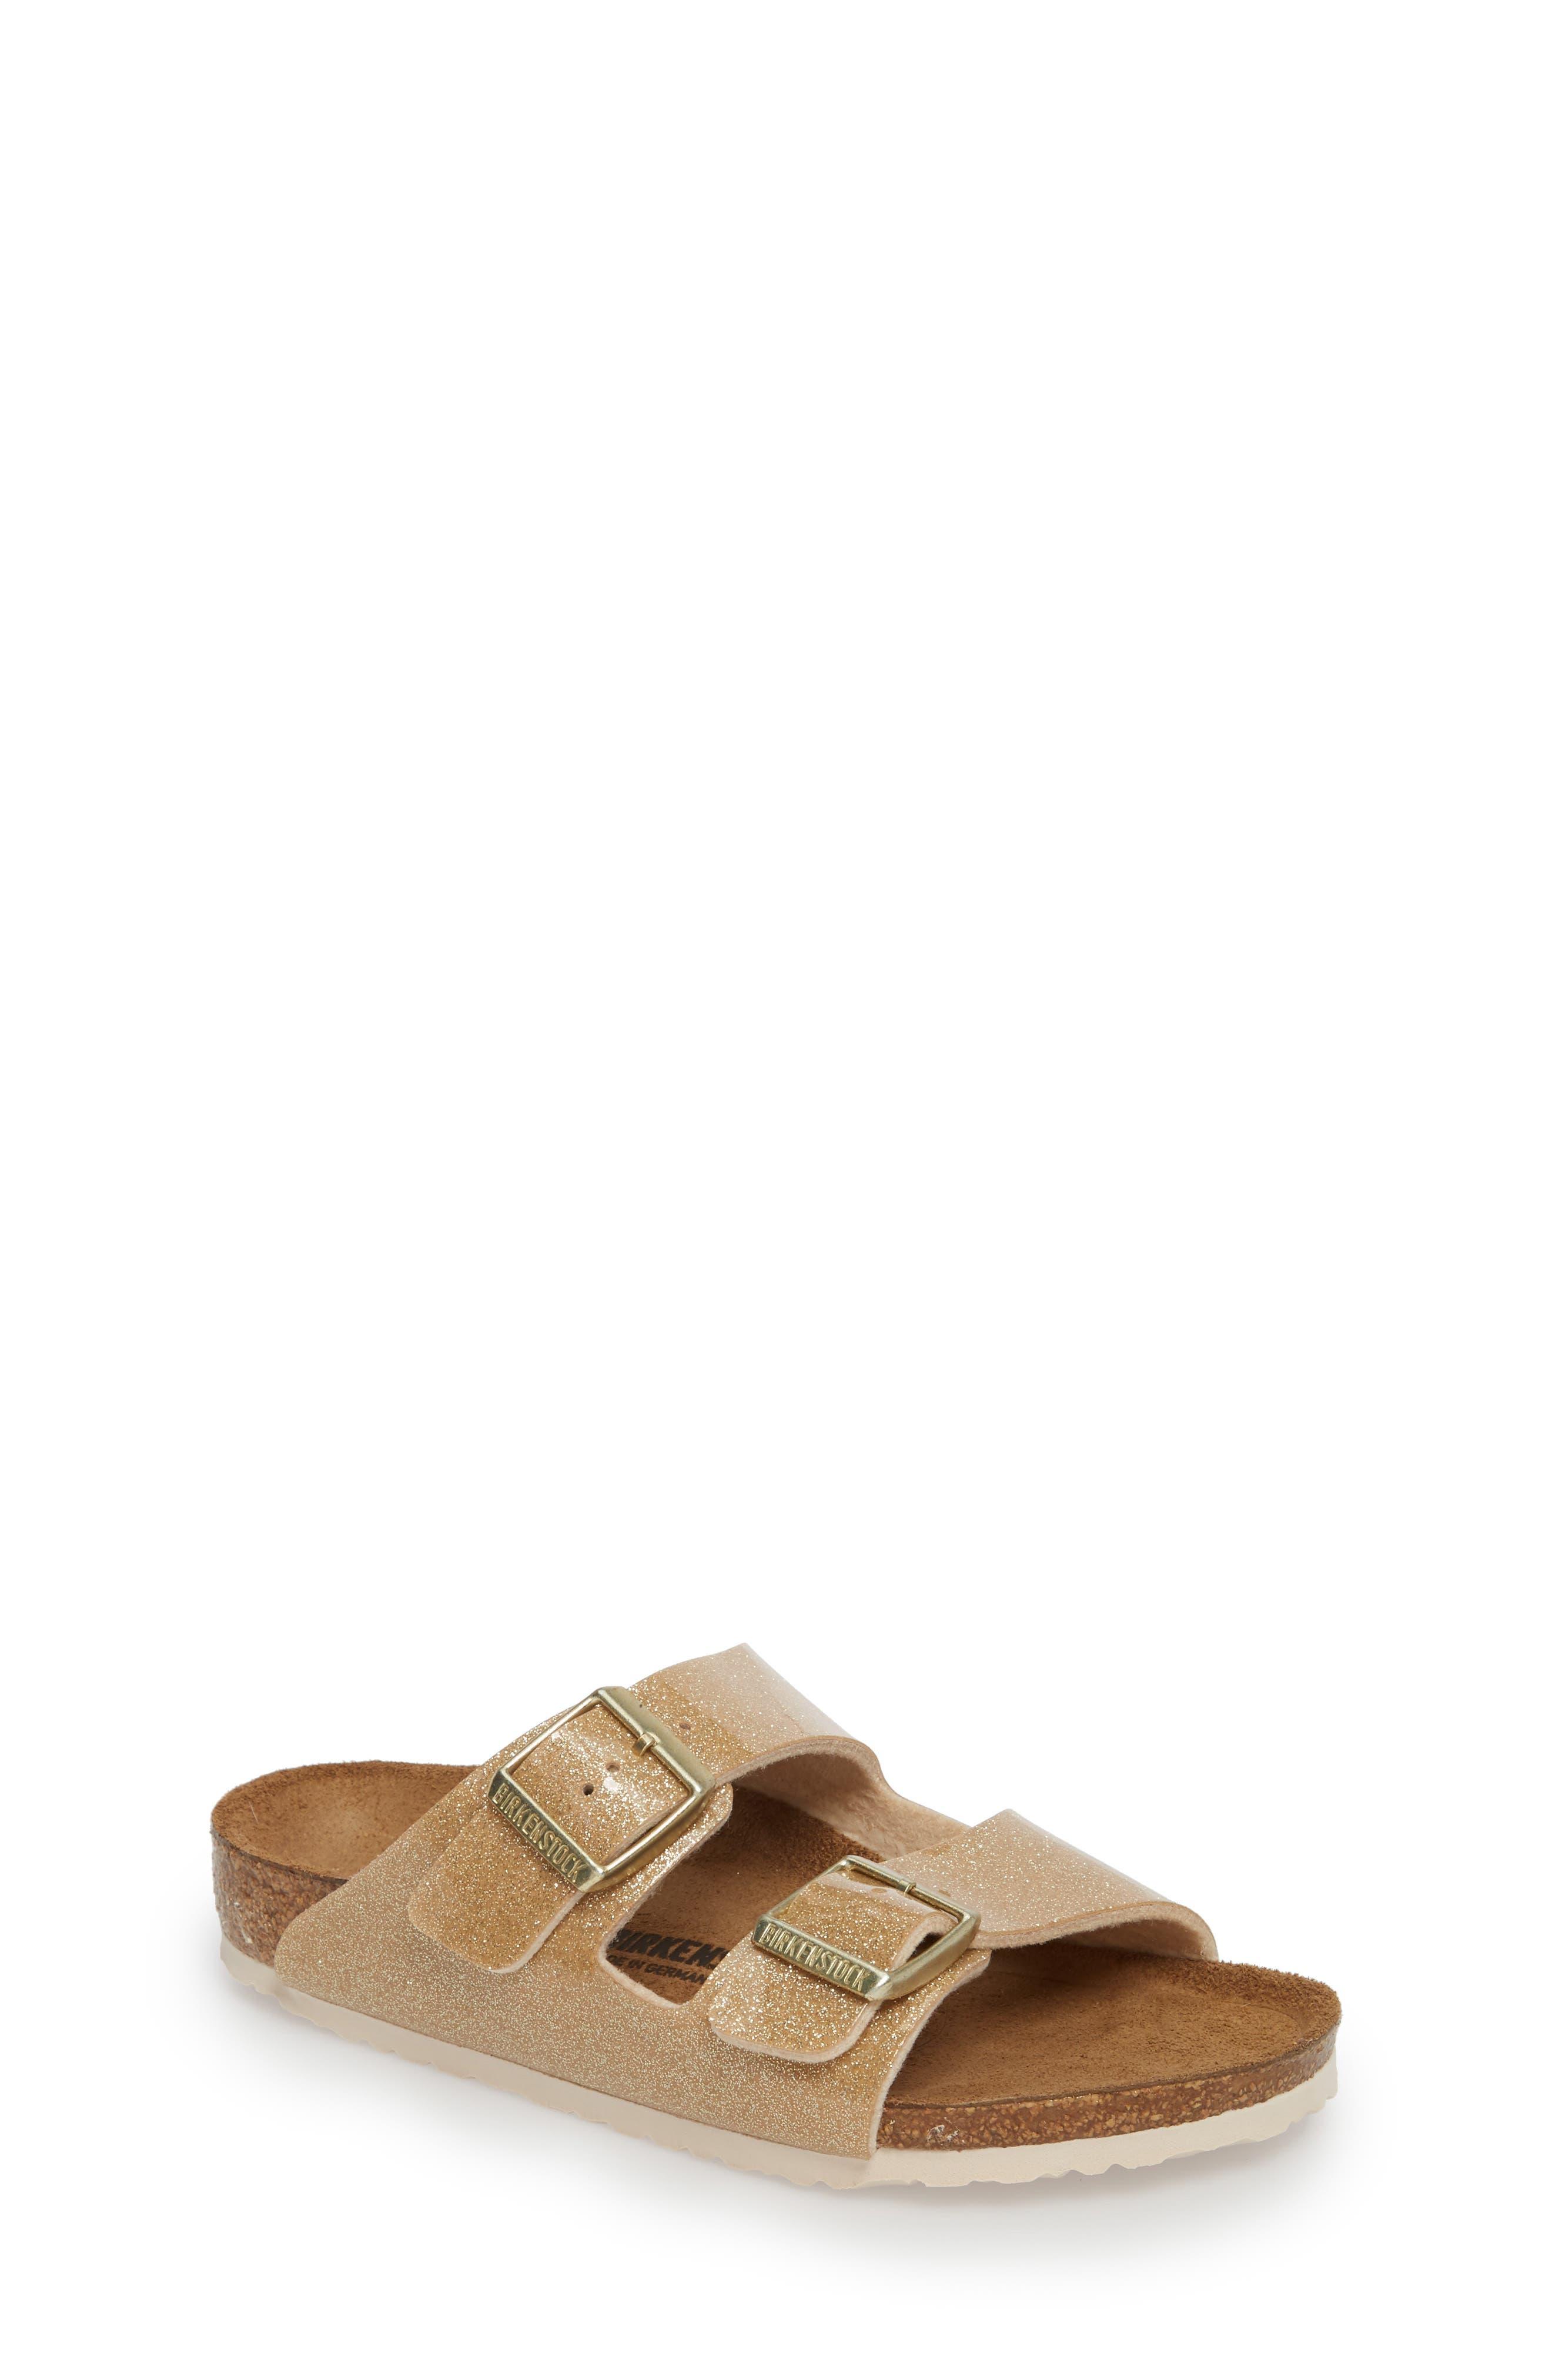 'Arizona Galaxy Birko-Flor' Slide Sandal,                         Main,                         color,